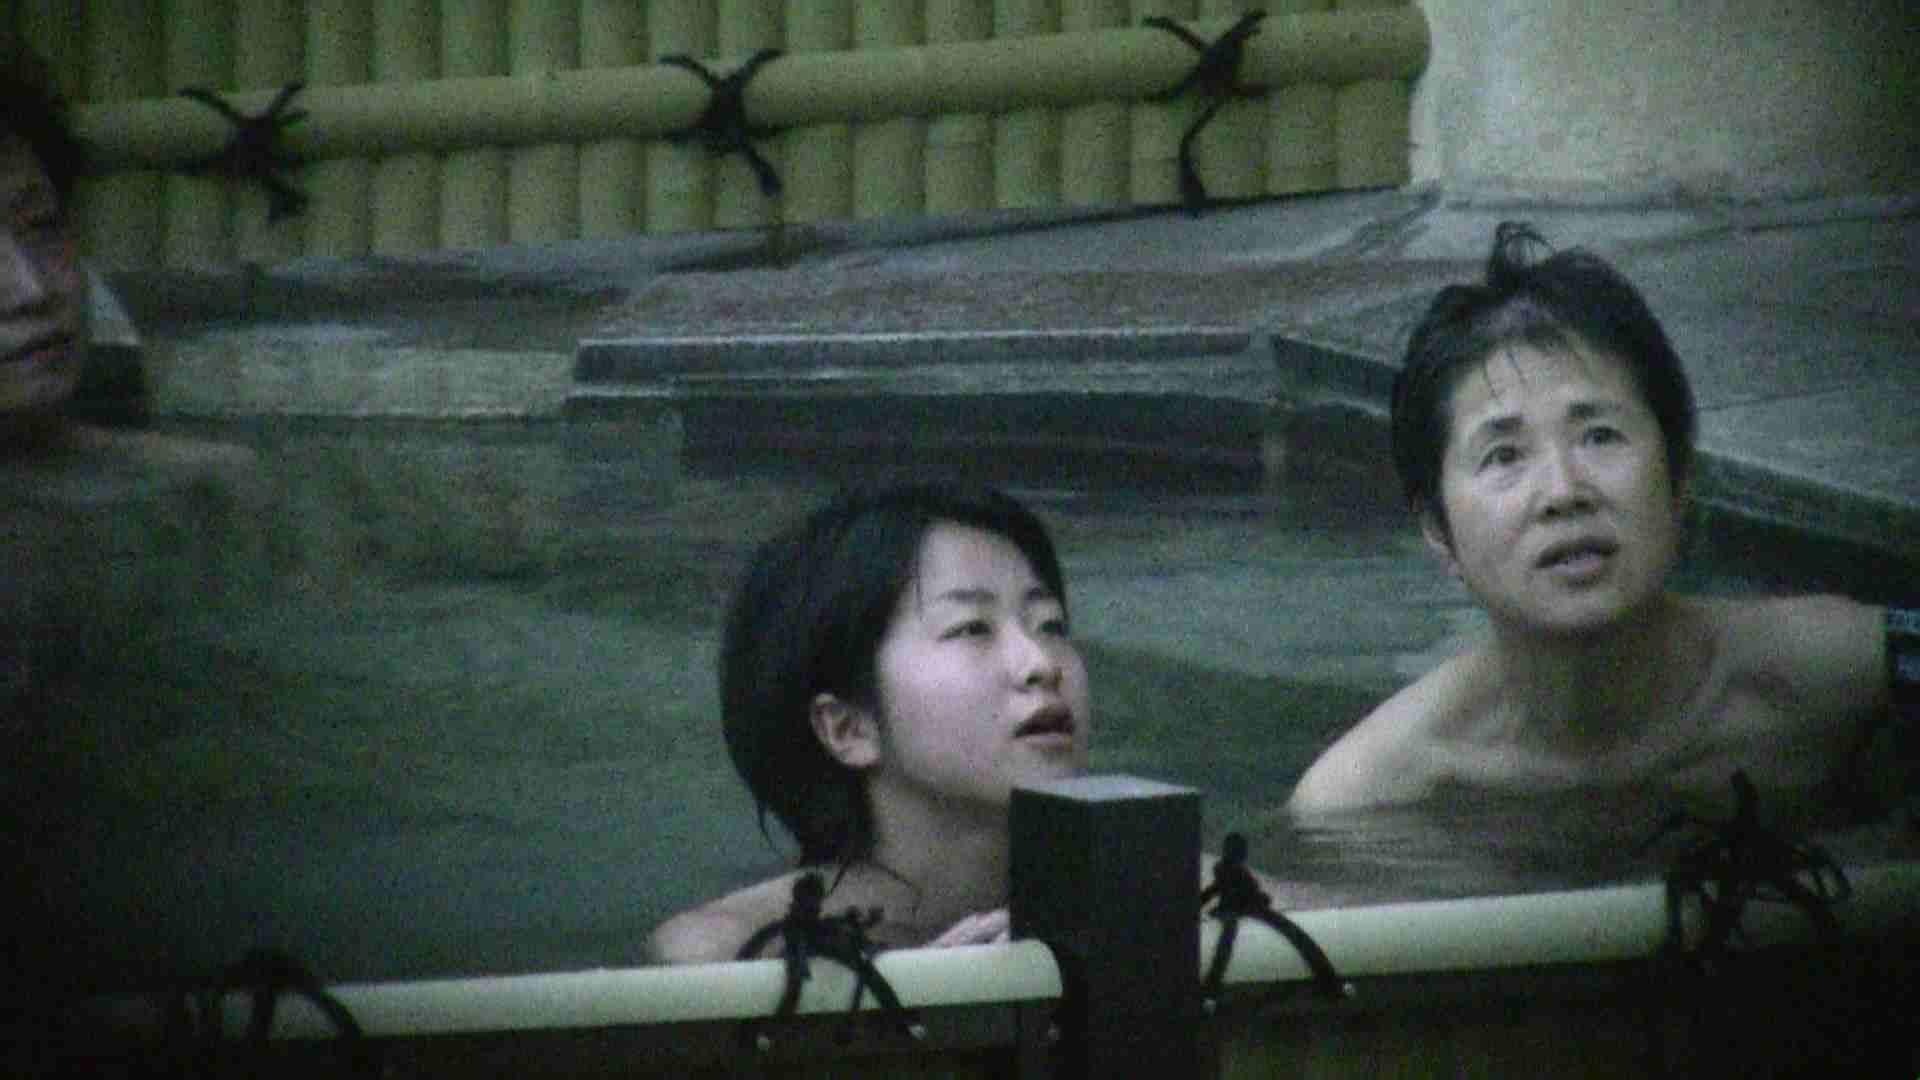 Aquaな露天風呂Vol.112 盗撮シリーズ   露天風呂編  93PIX 45